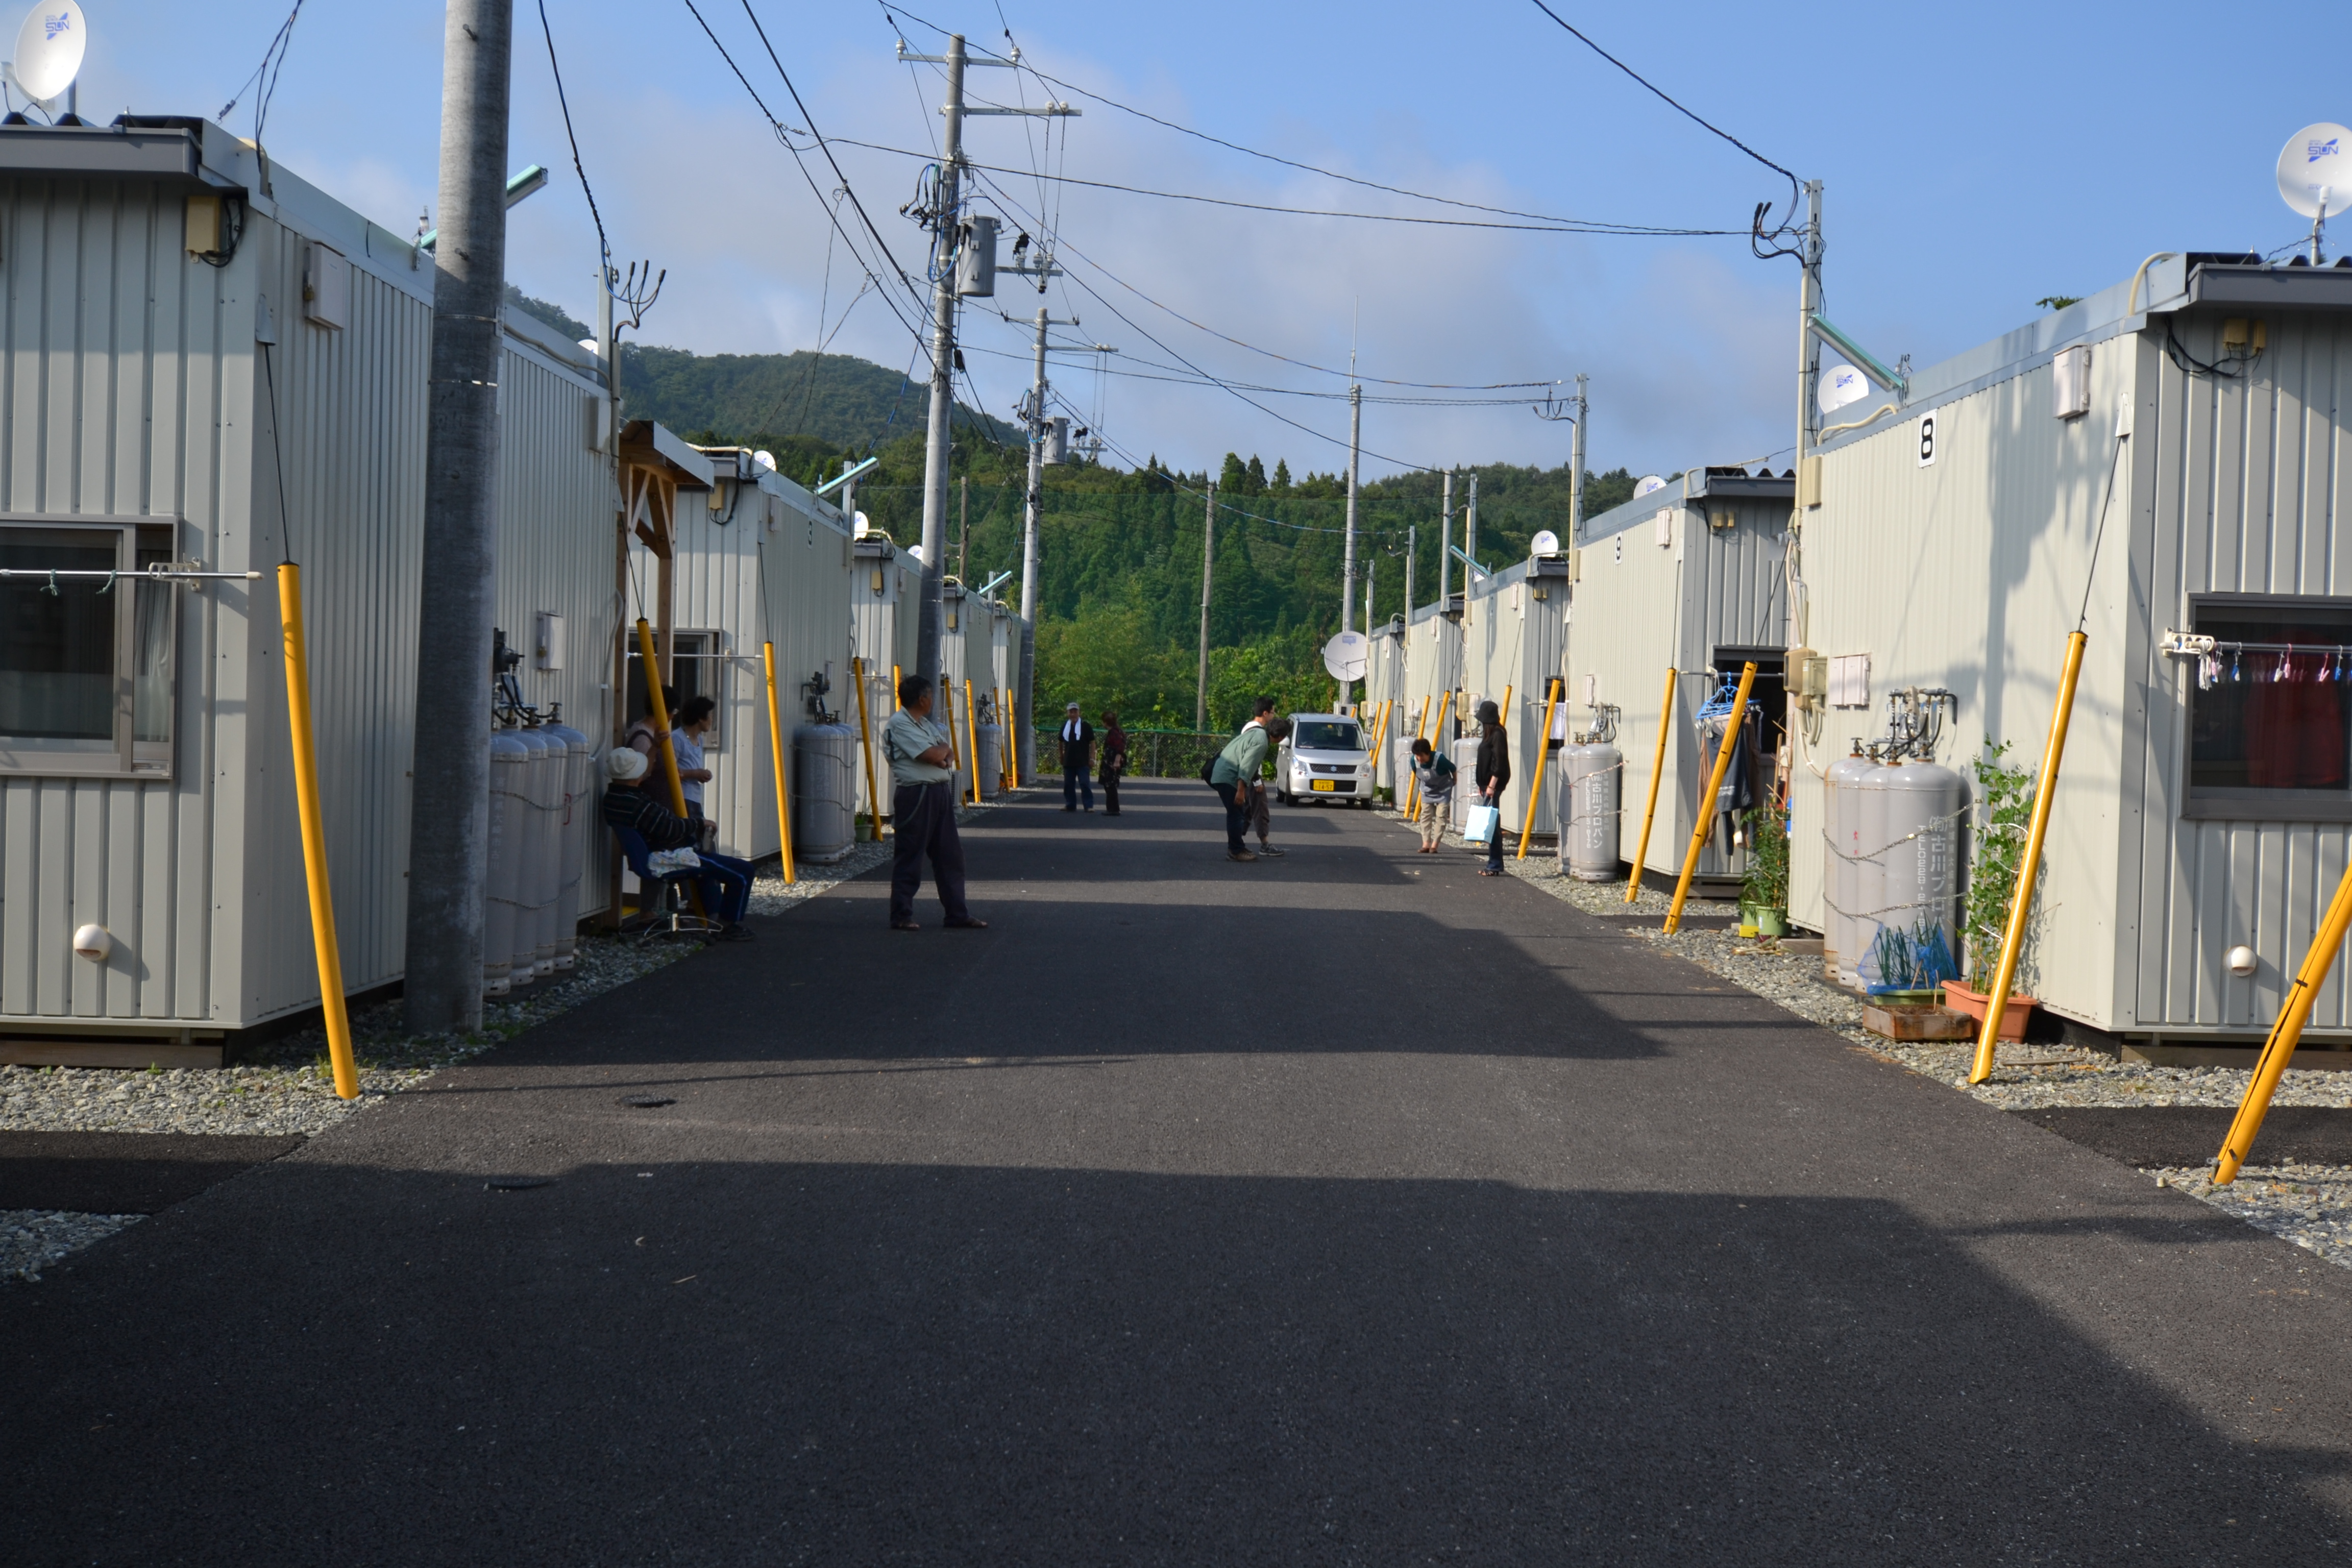 naburi nearby temp housing complex kasetsu one of many in tohoku.JPG